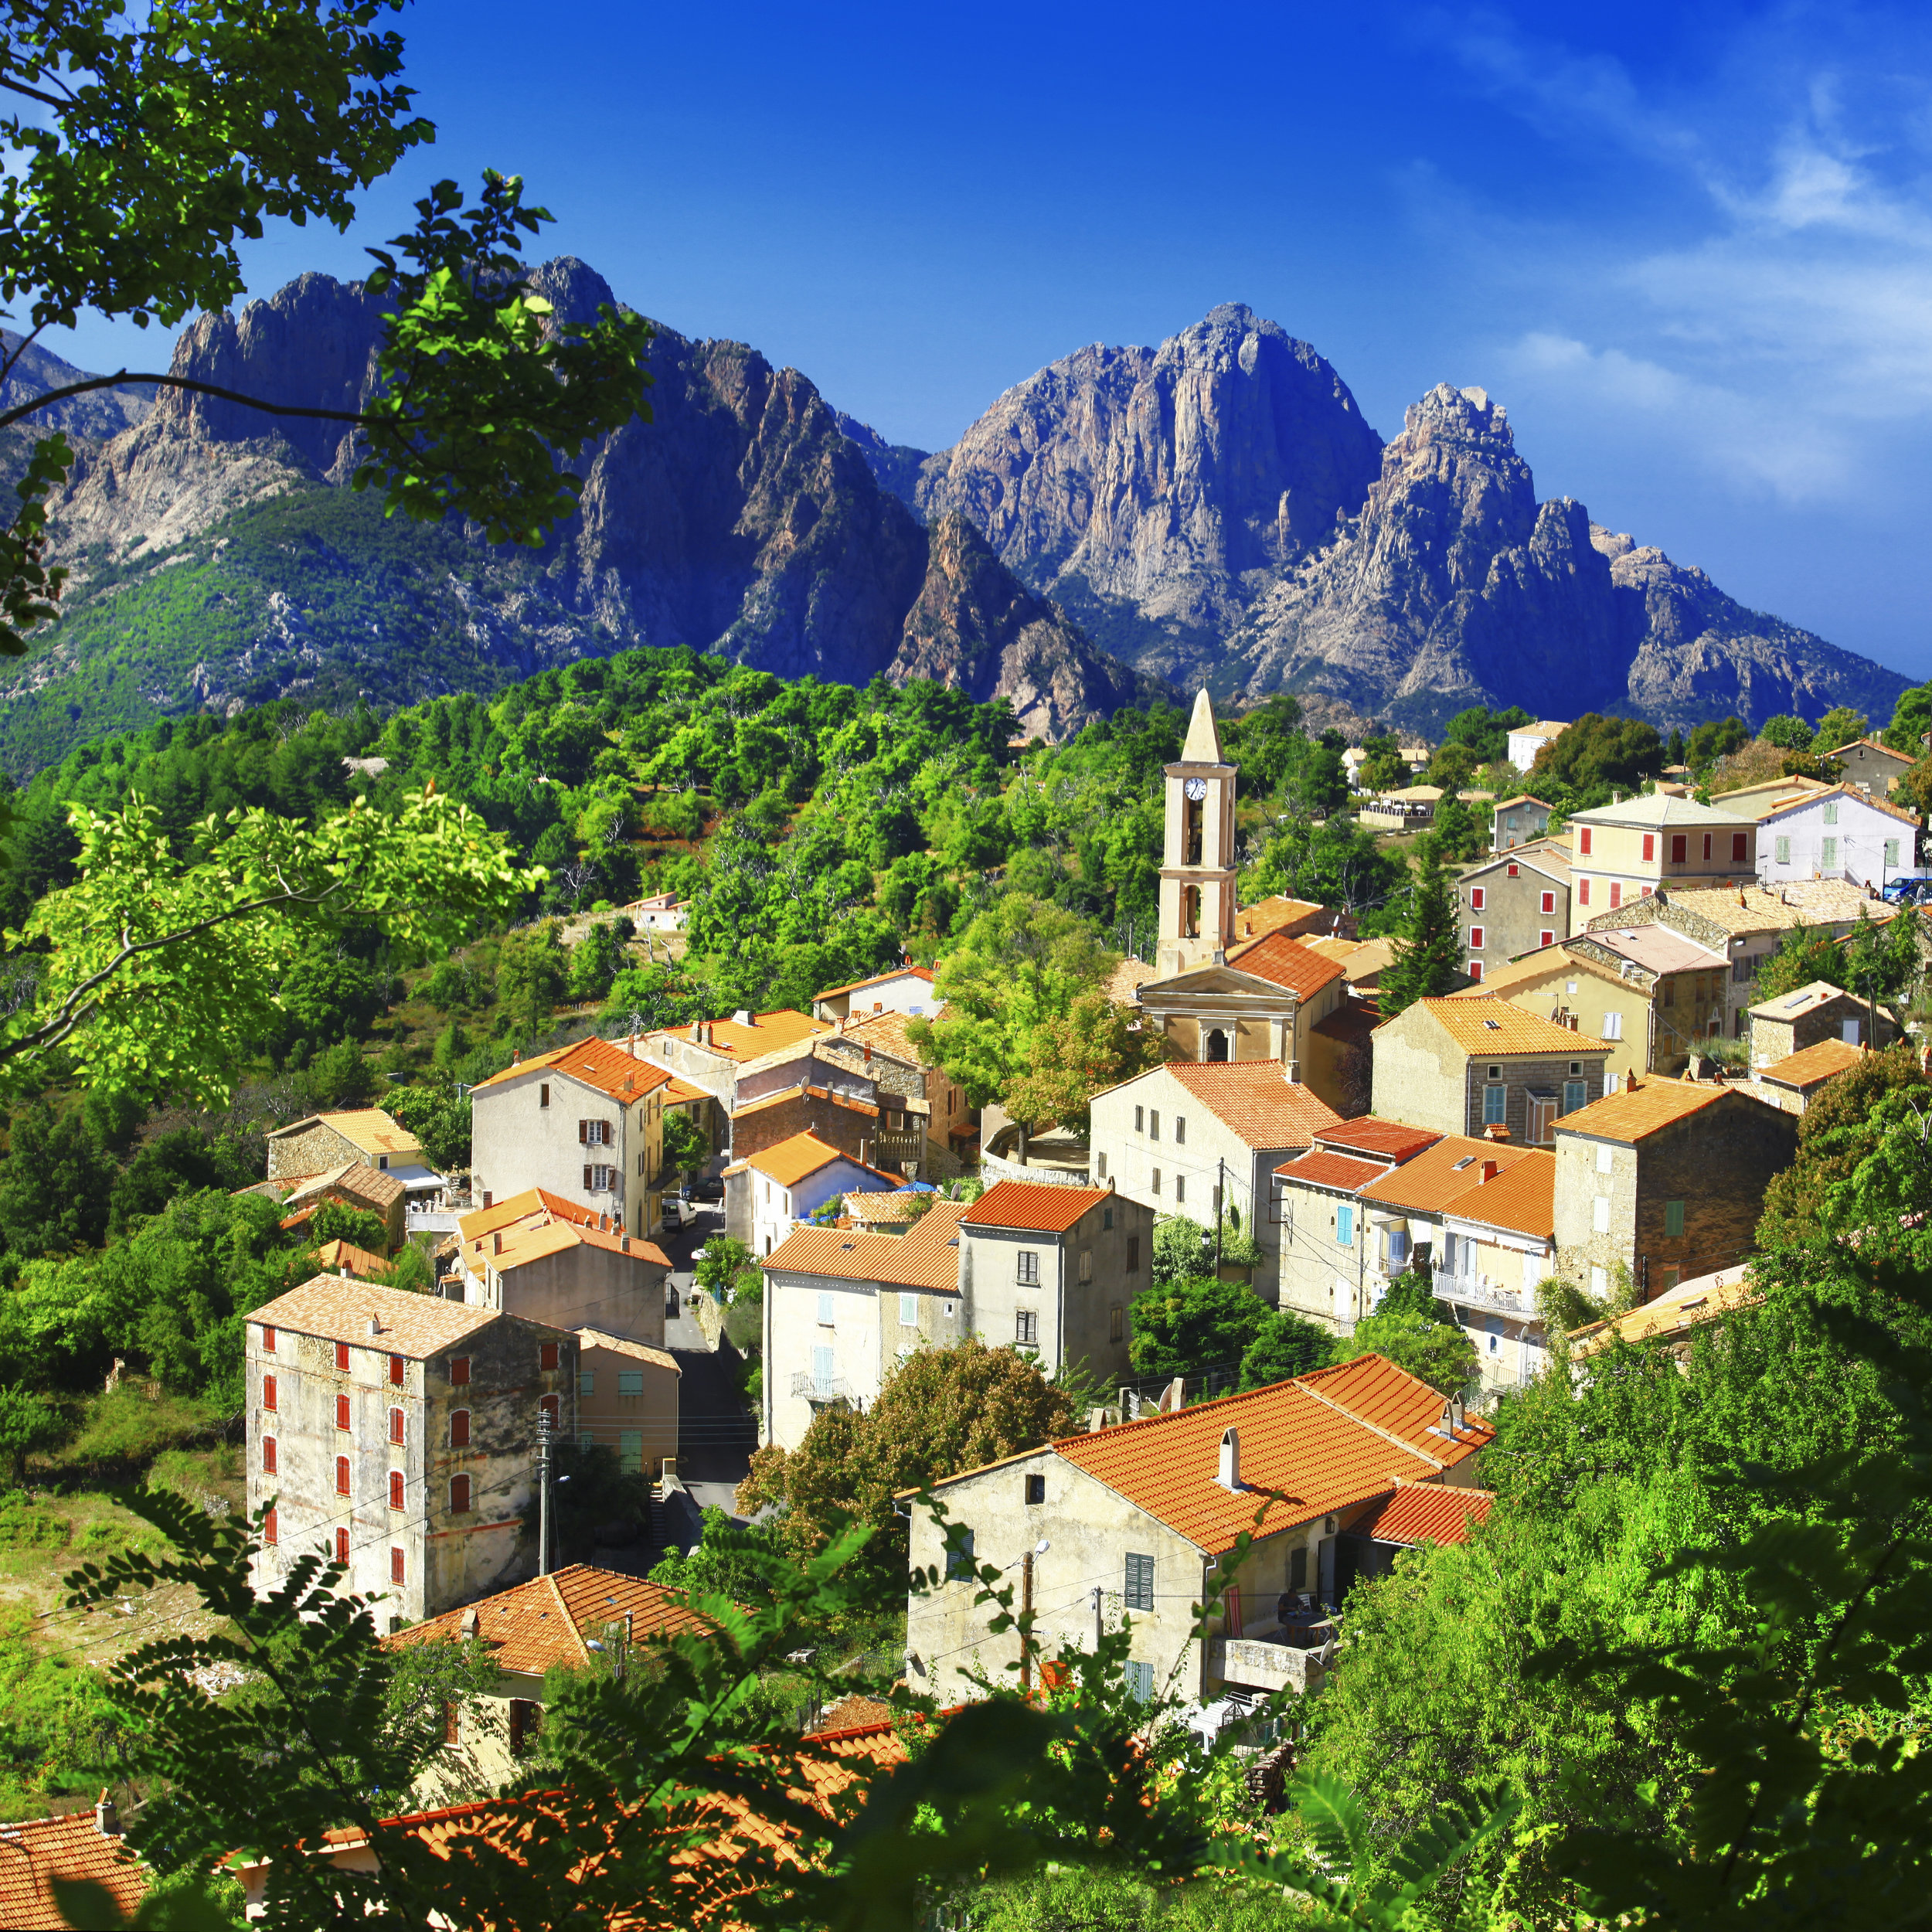 Copy of Mountain village